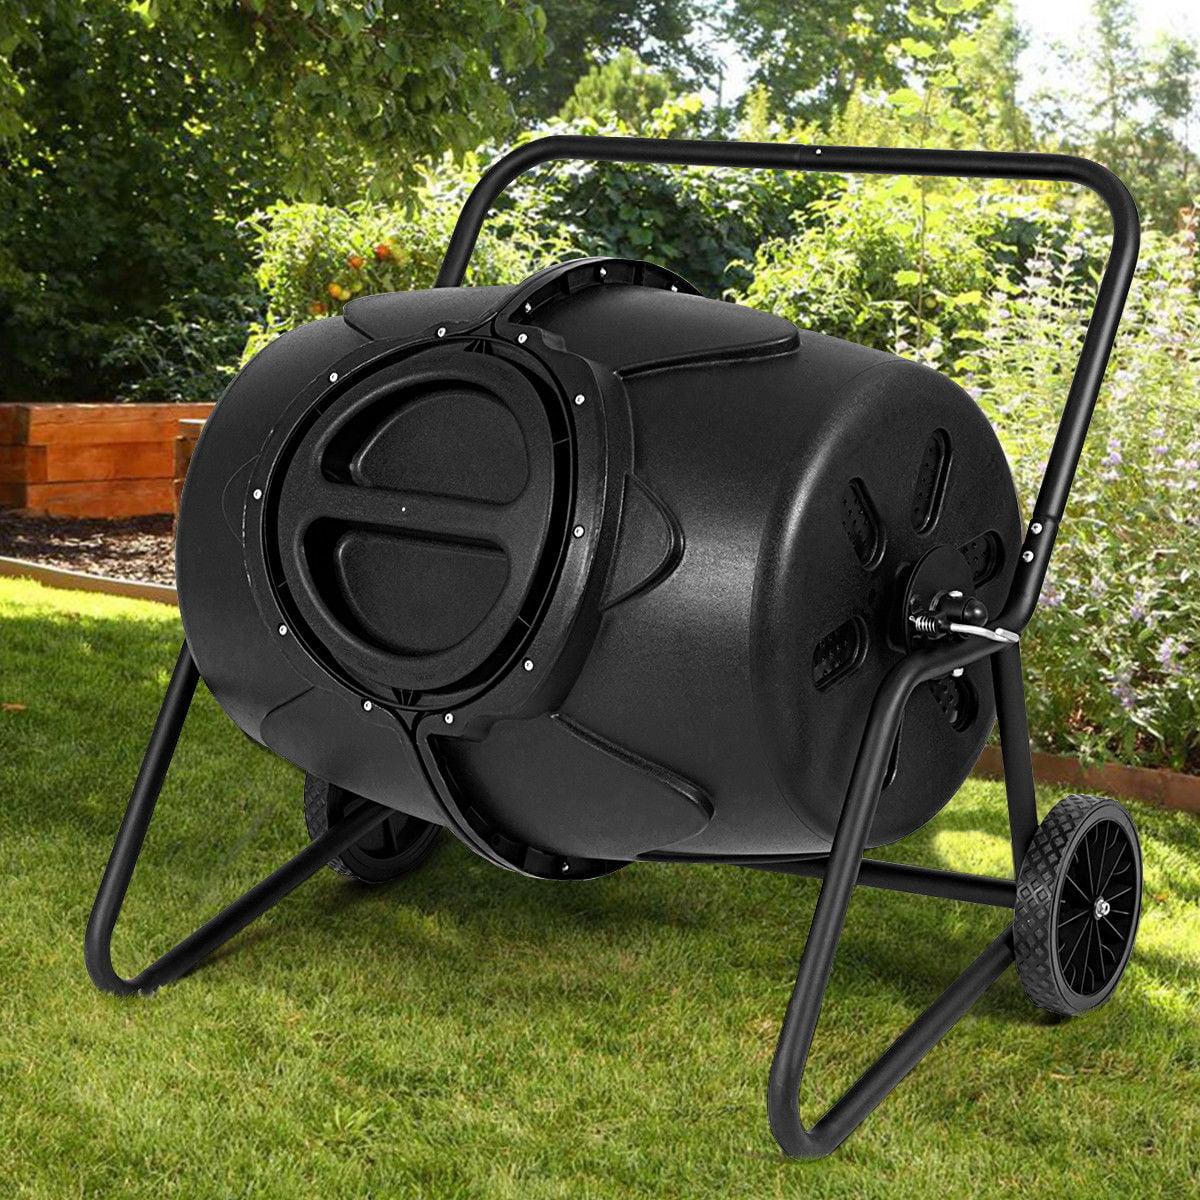 Costway 50 Gallon Wheeled Compost Tumbler Garden Waste Bin Grass Trash Barrel Fertilizer